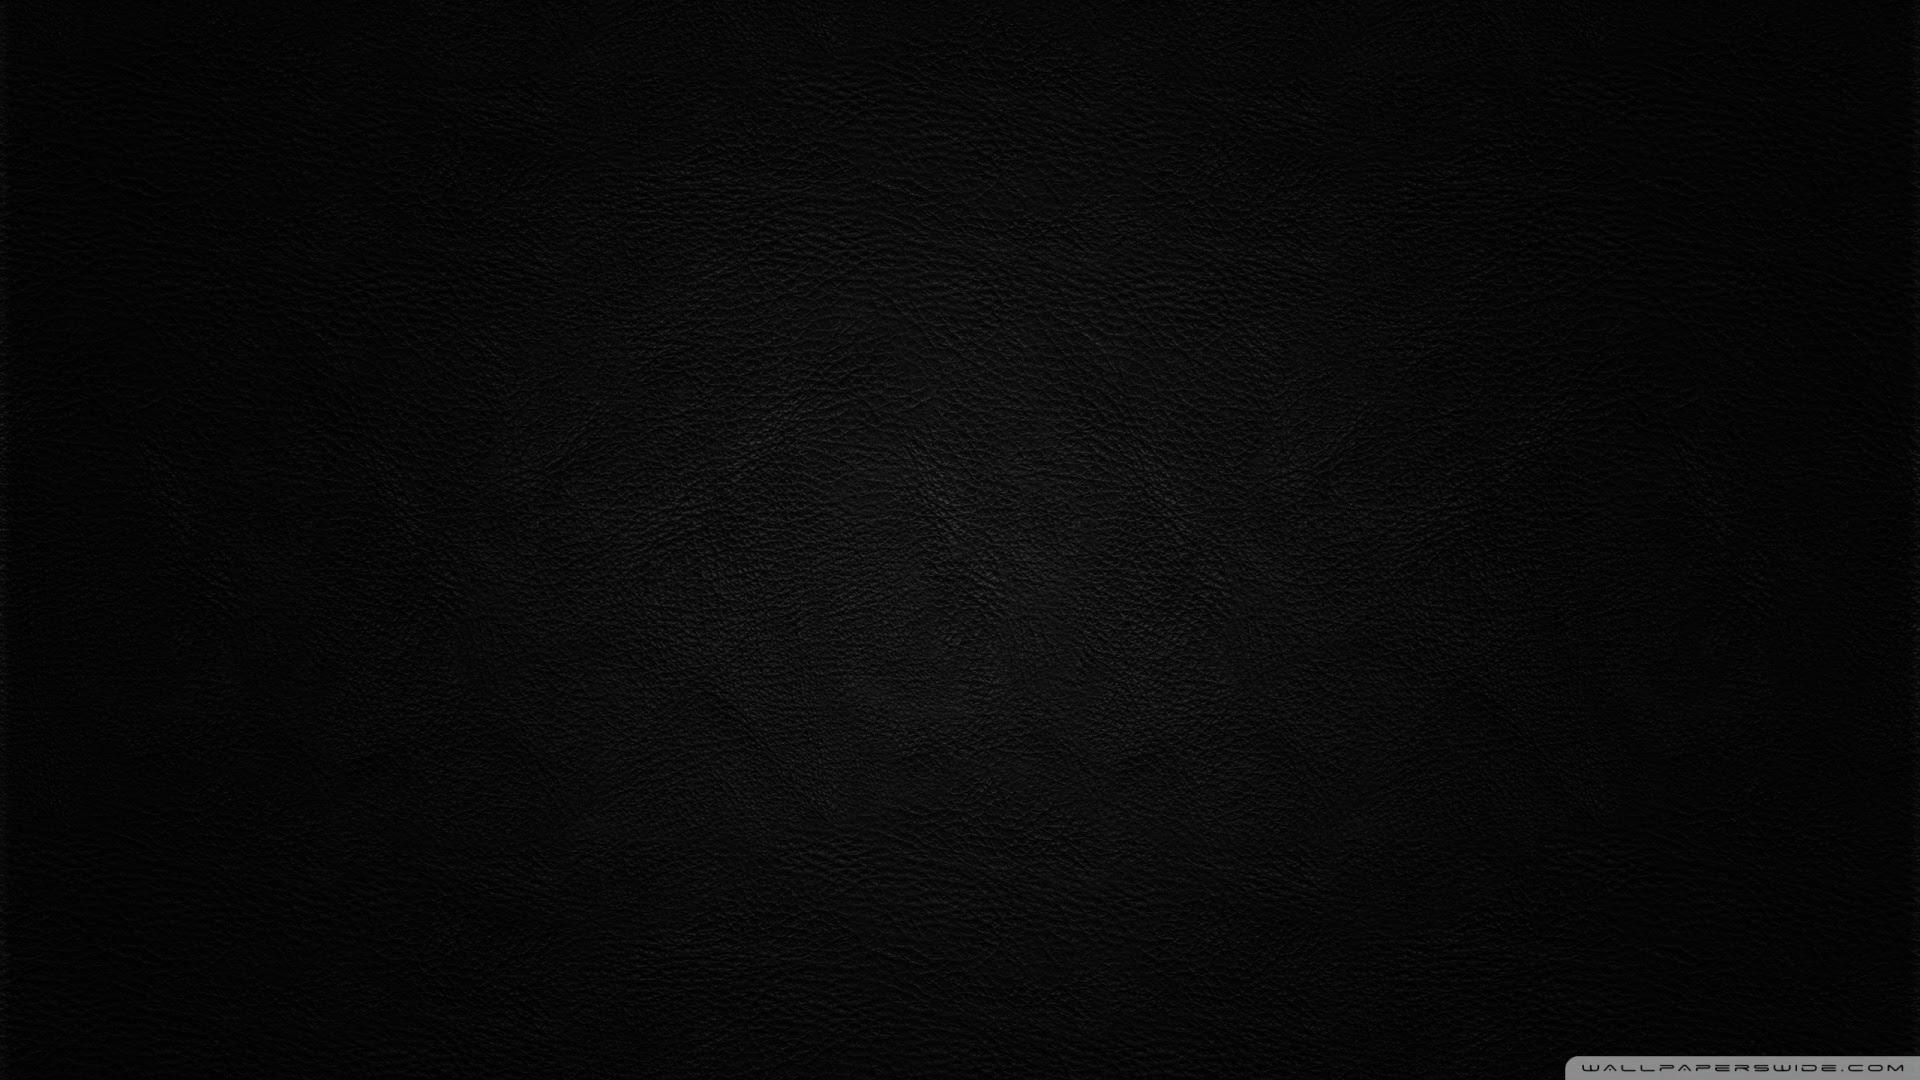 Download 42+ Background Tumblr Black Terbaik